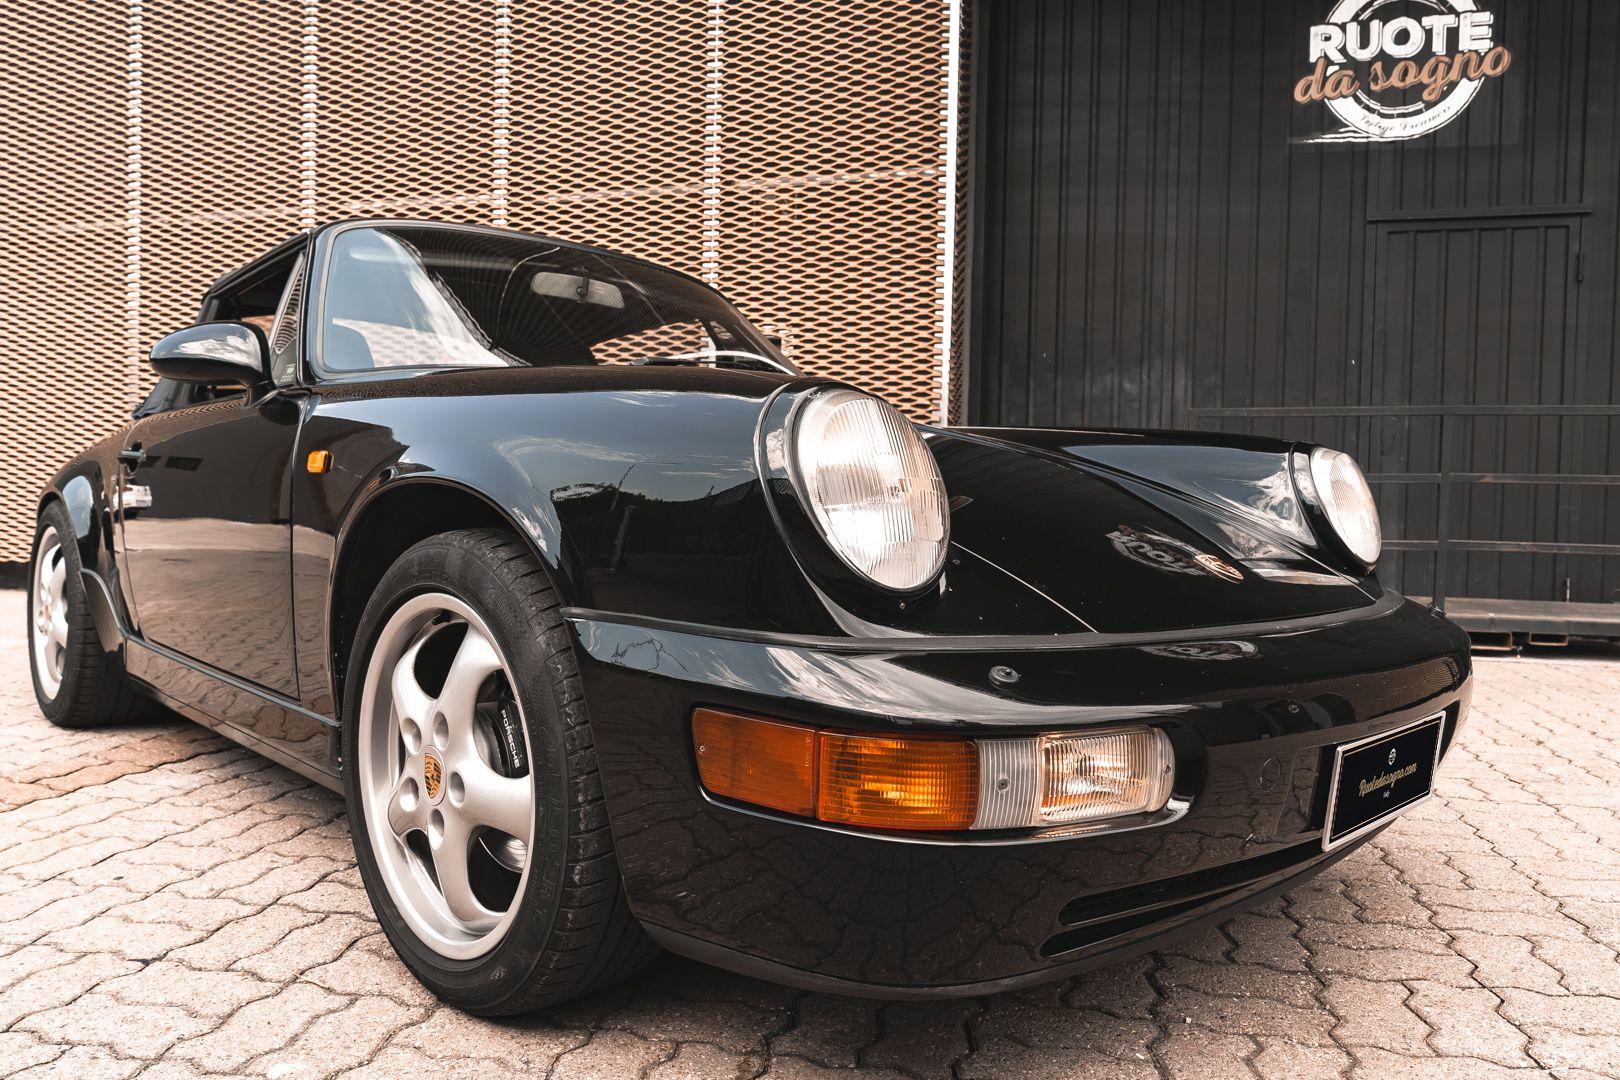 1991 Porsche 911/964 Carrera 4 79220